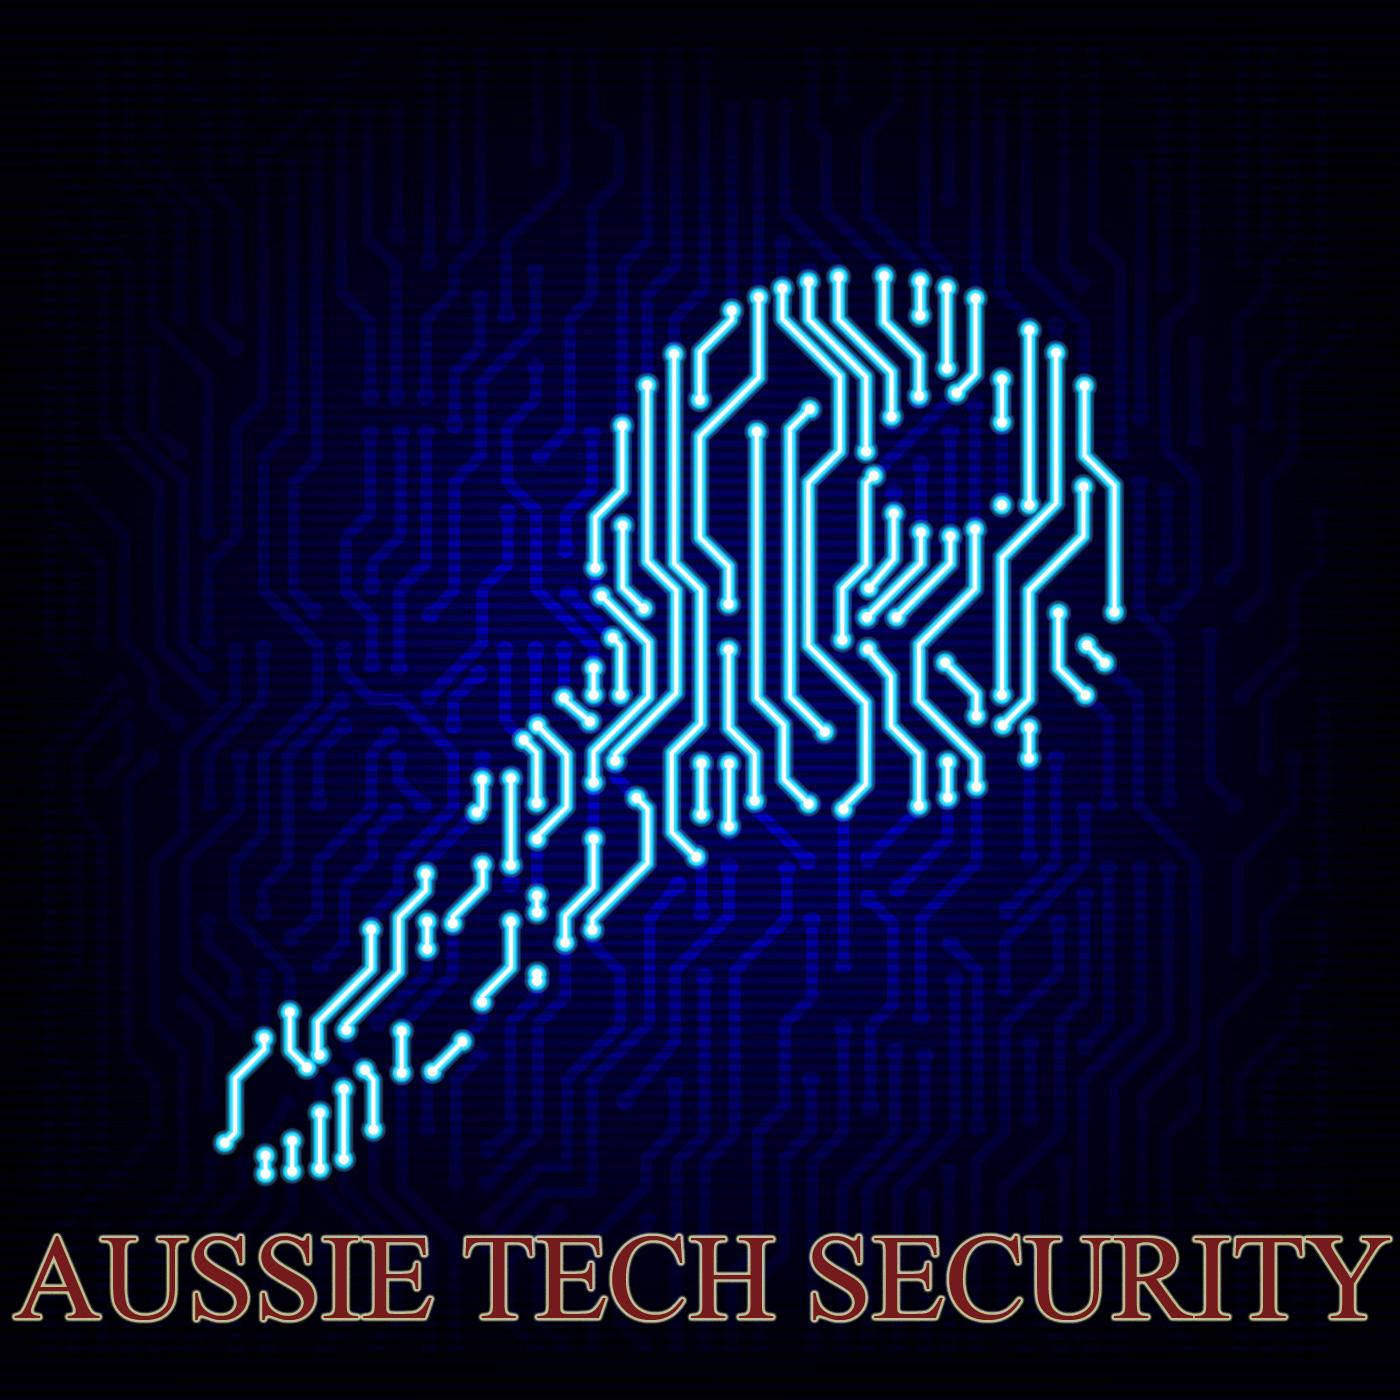 Aussie Tech Security